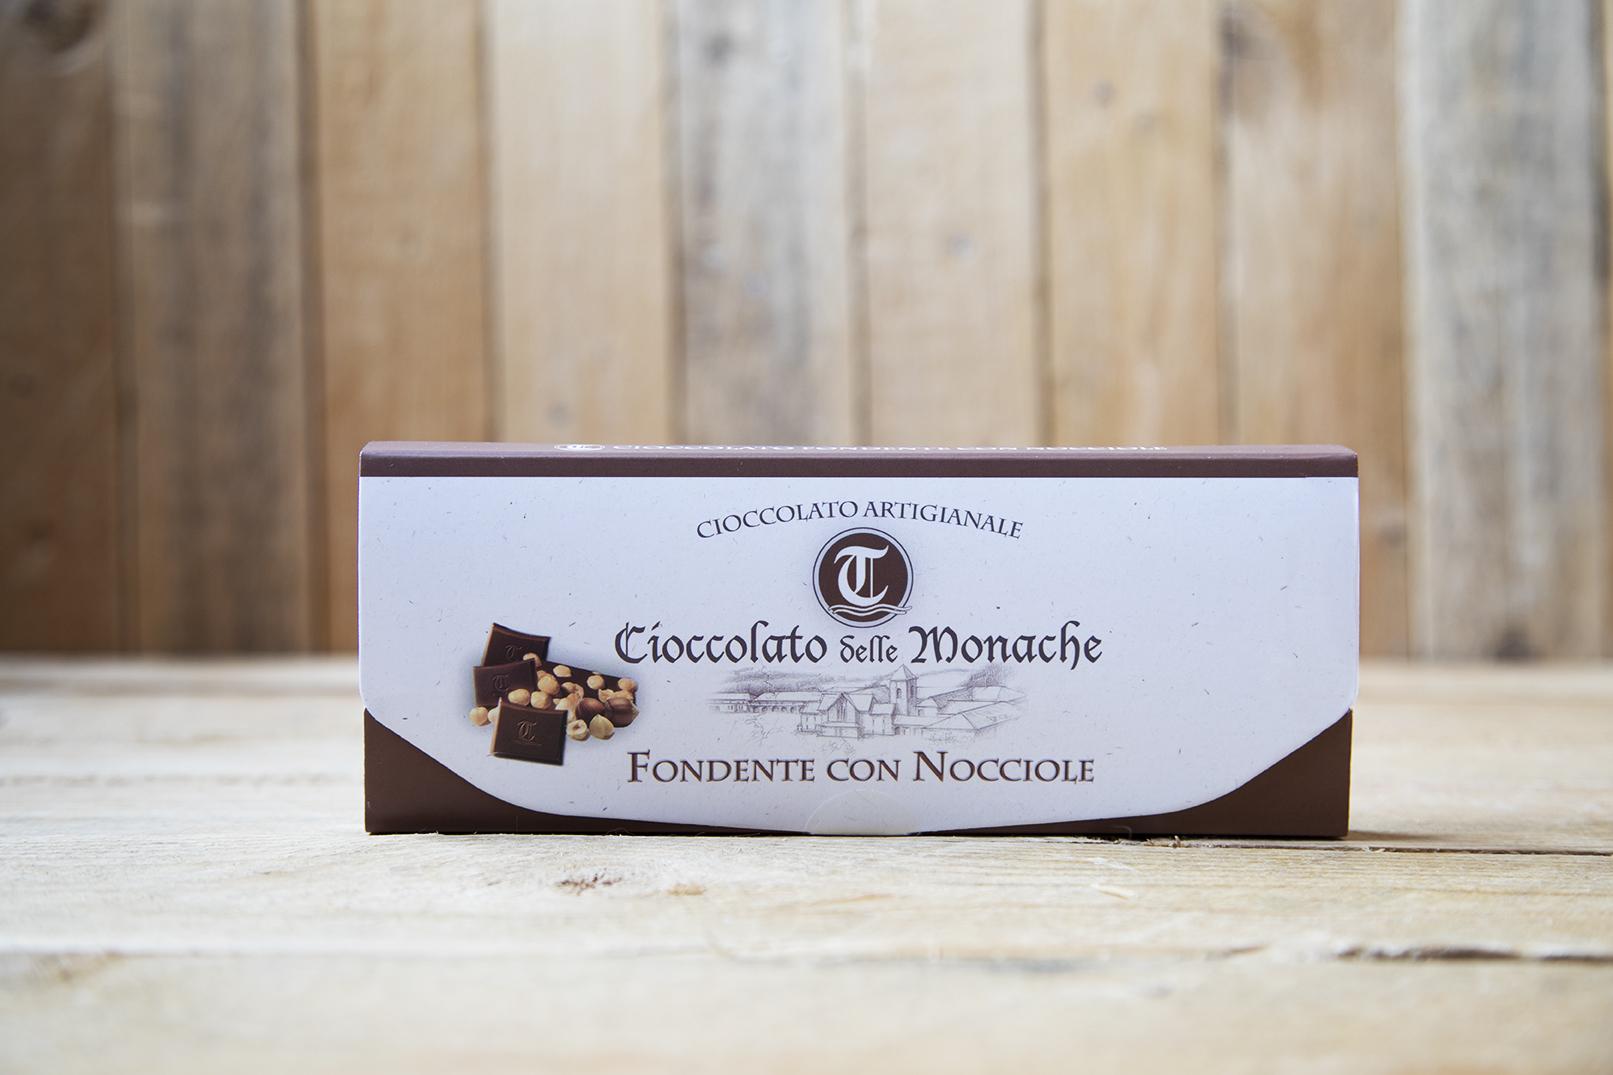 Cioccolato fondente con nocciole